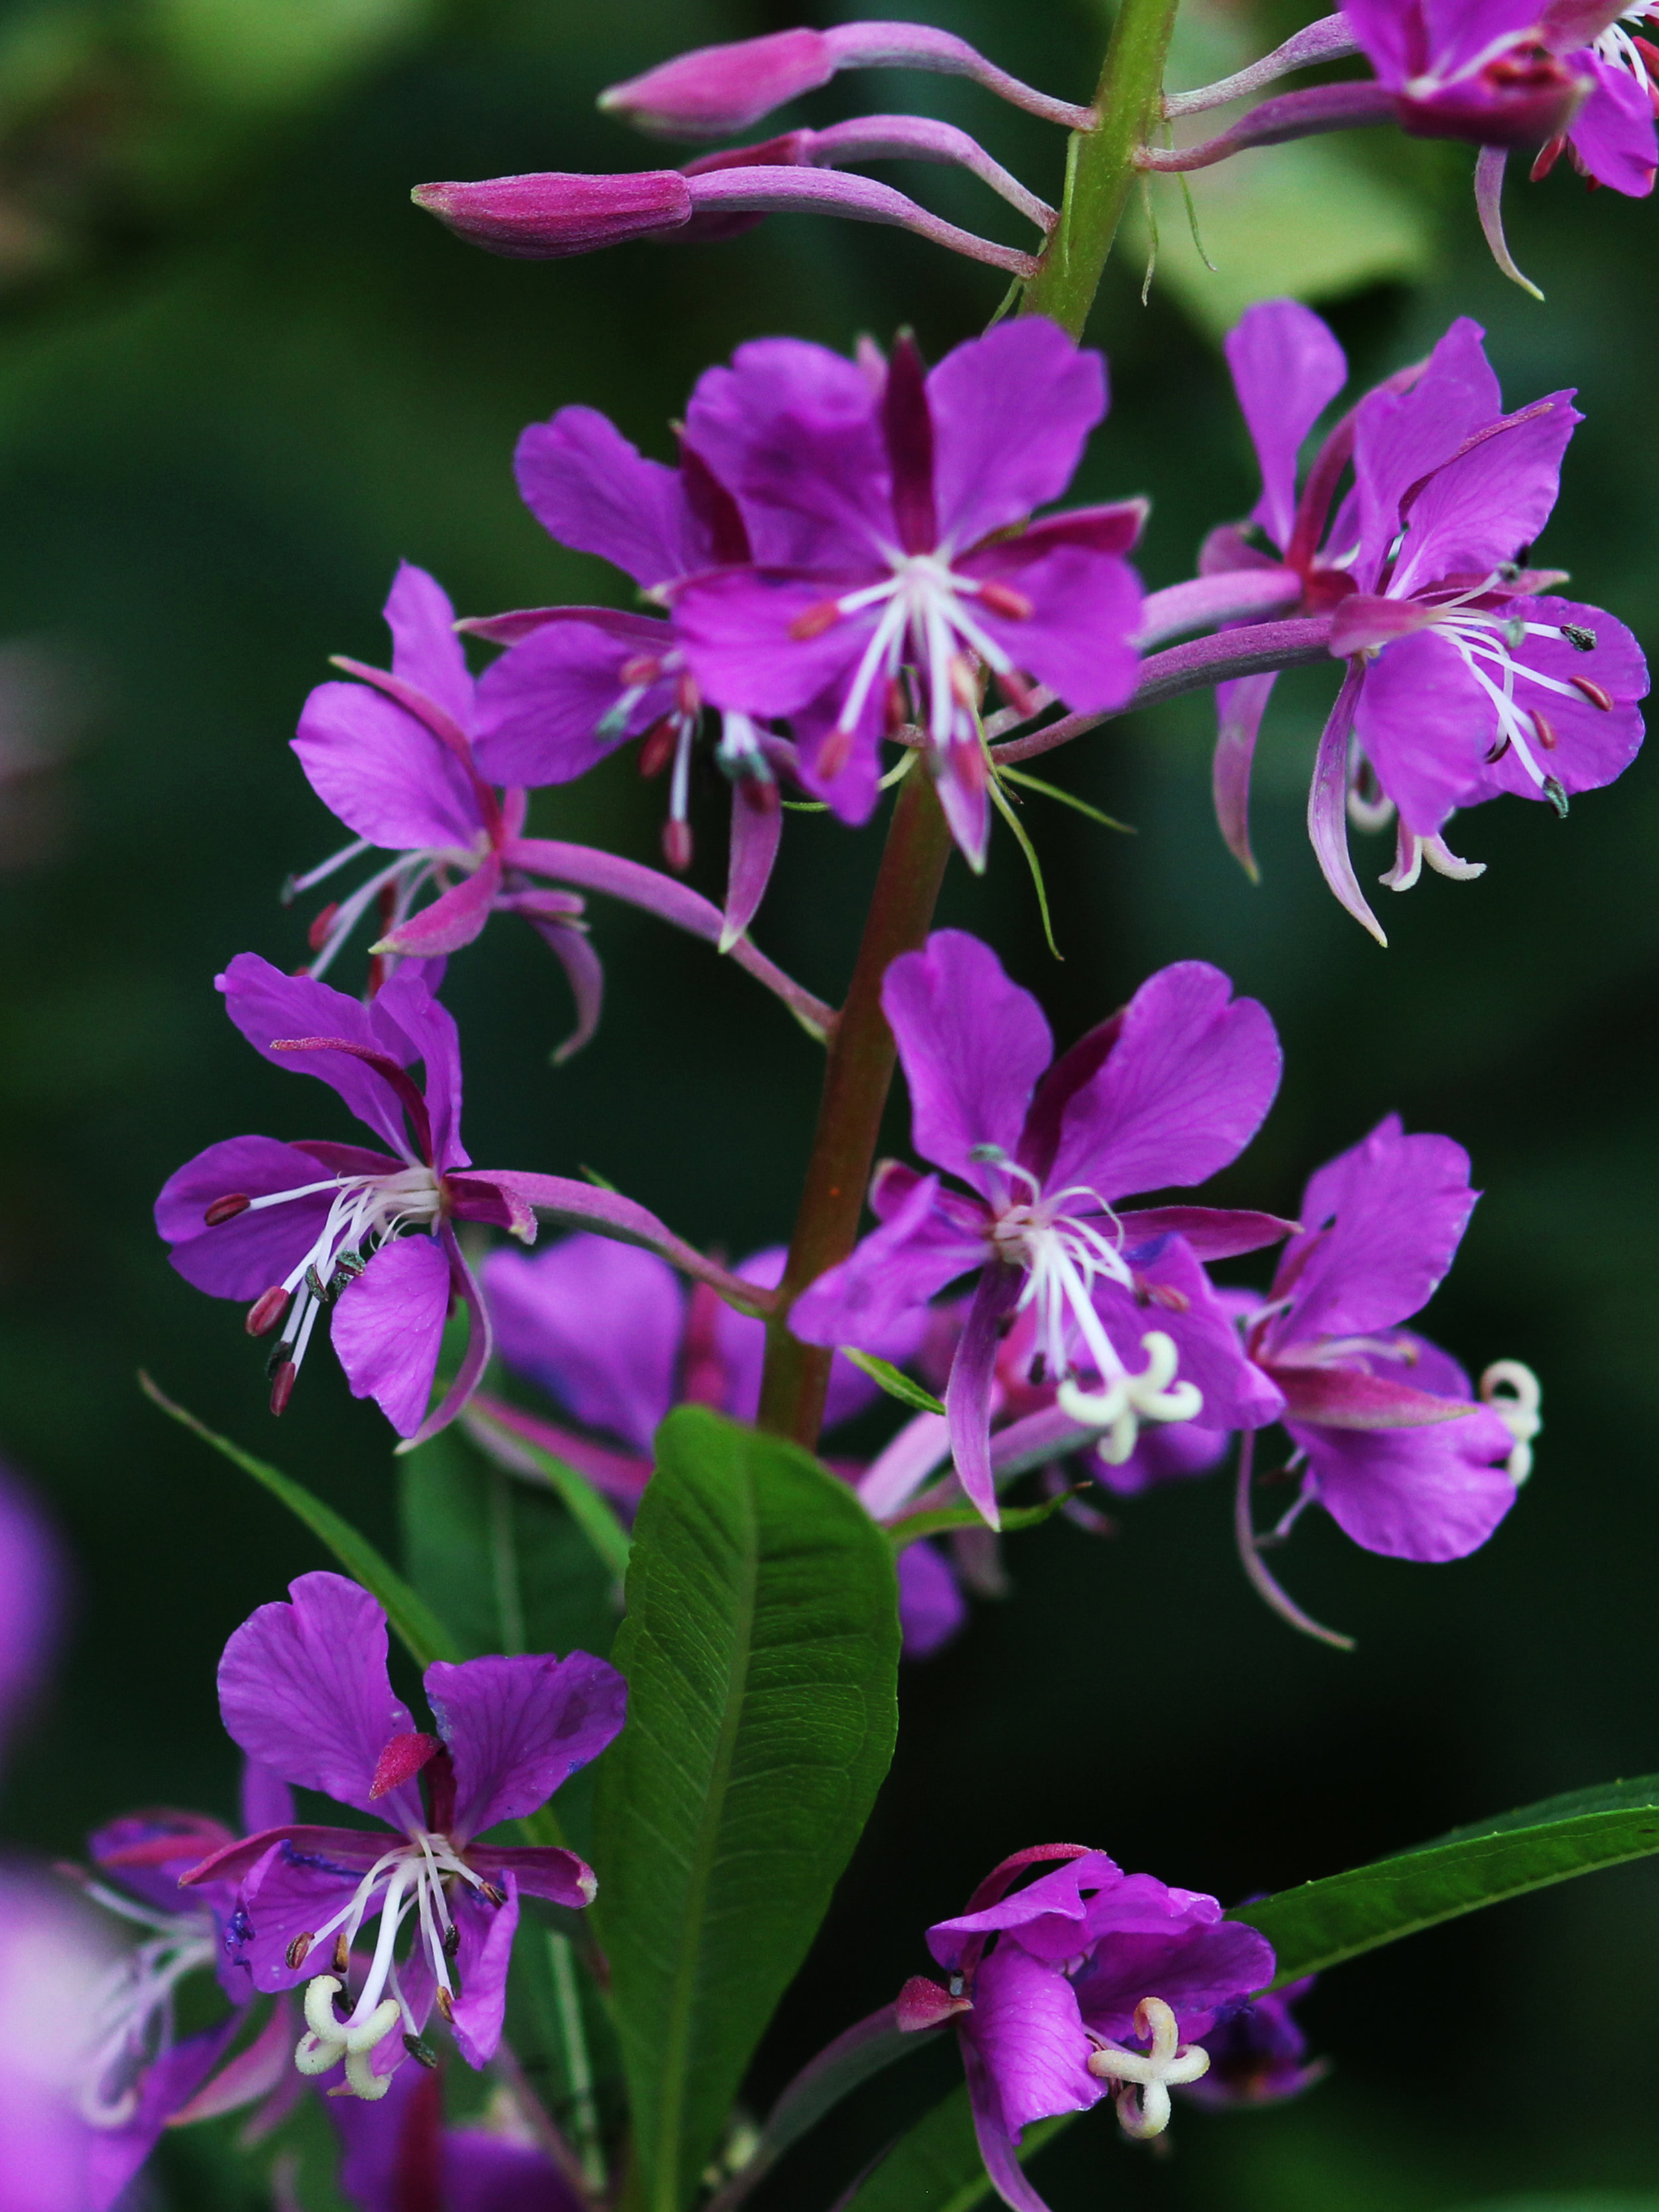 16.07.07_CA_purple_flower_KJC.jpg